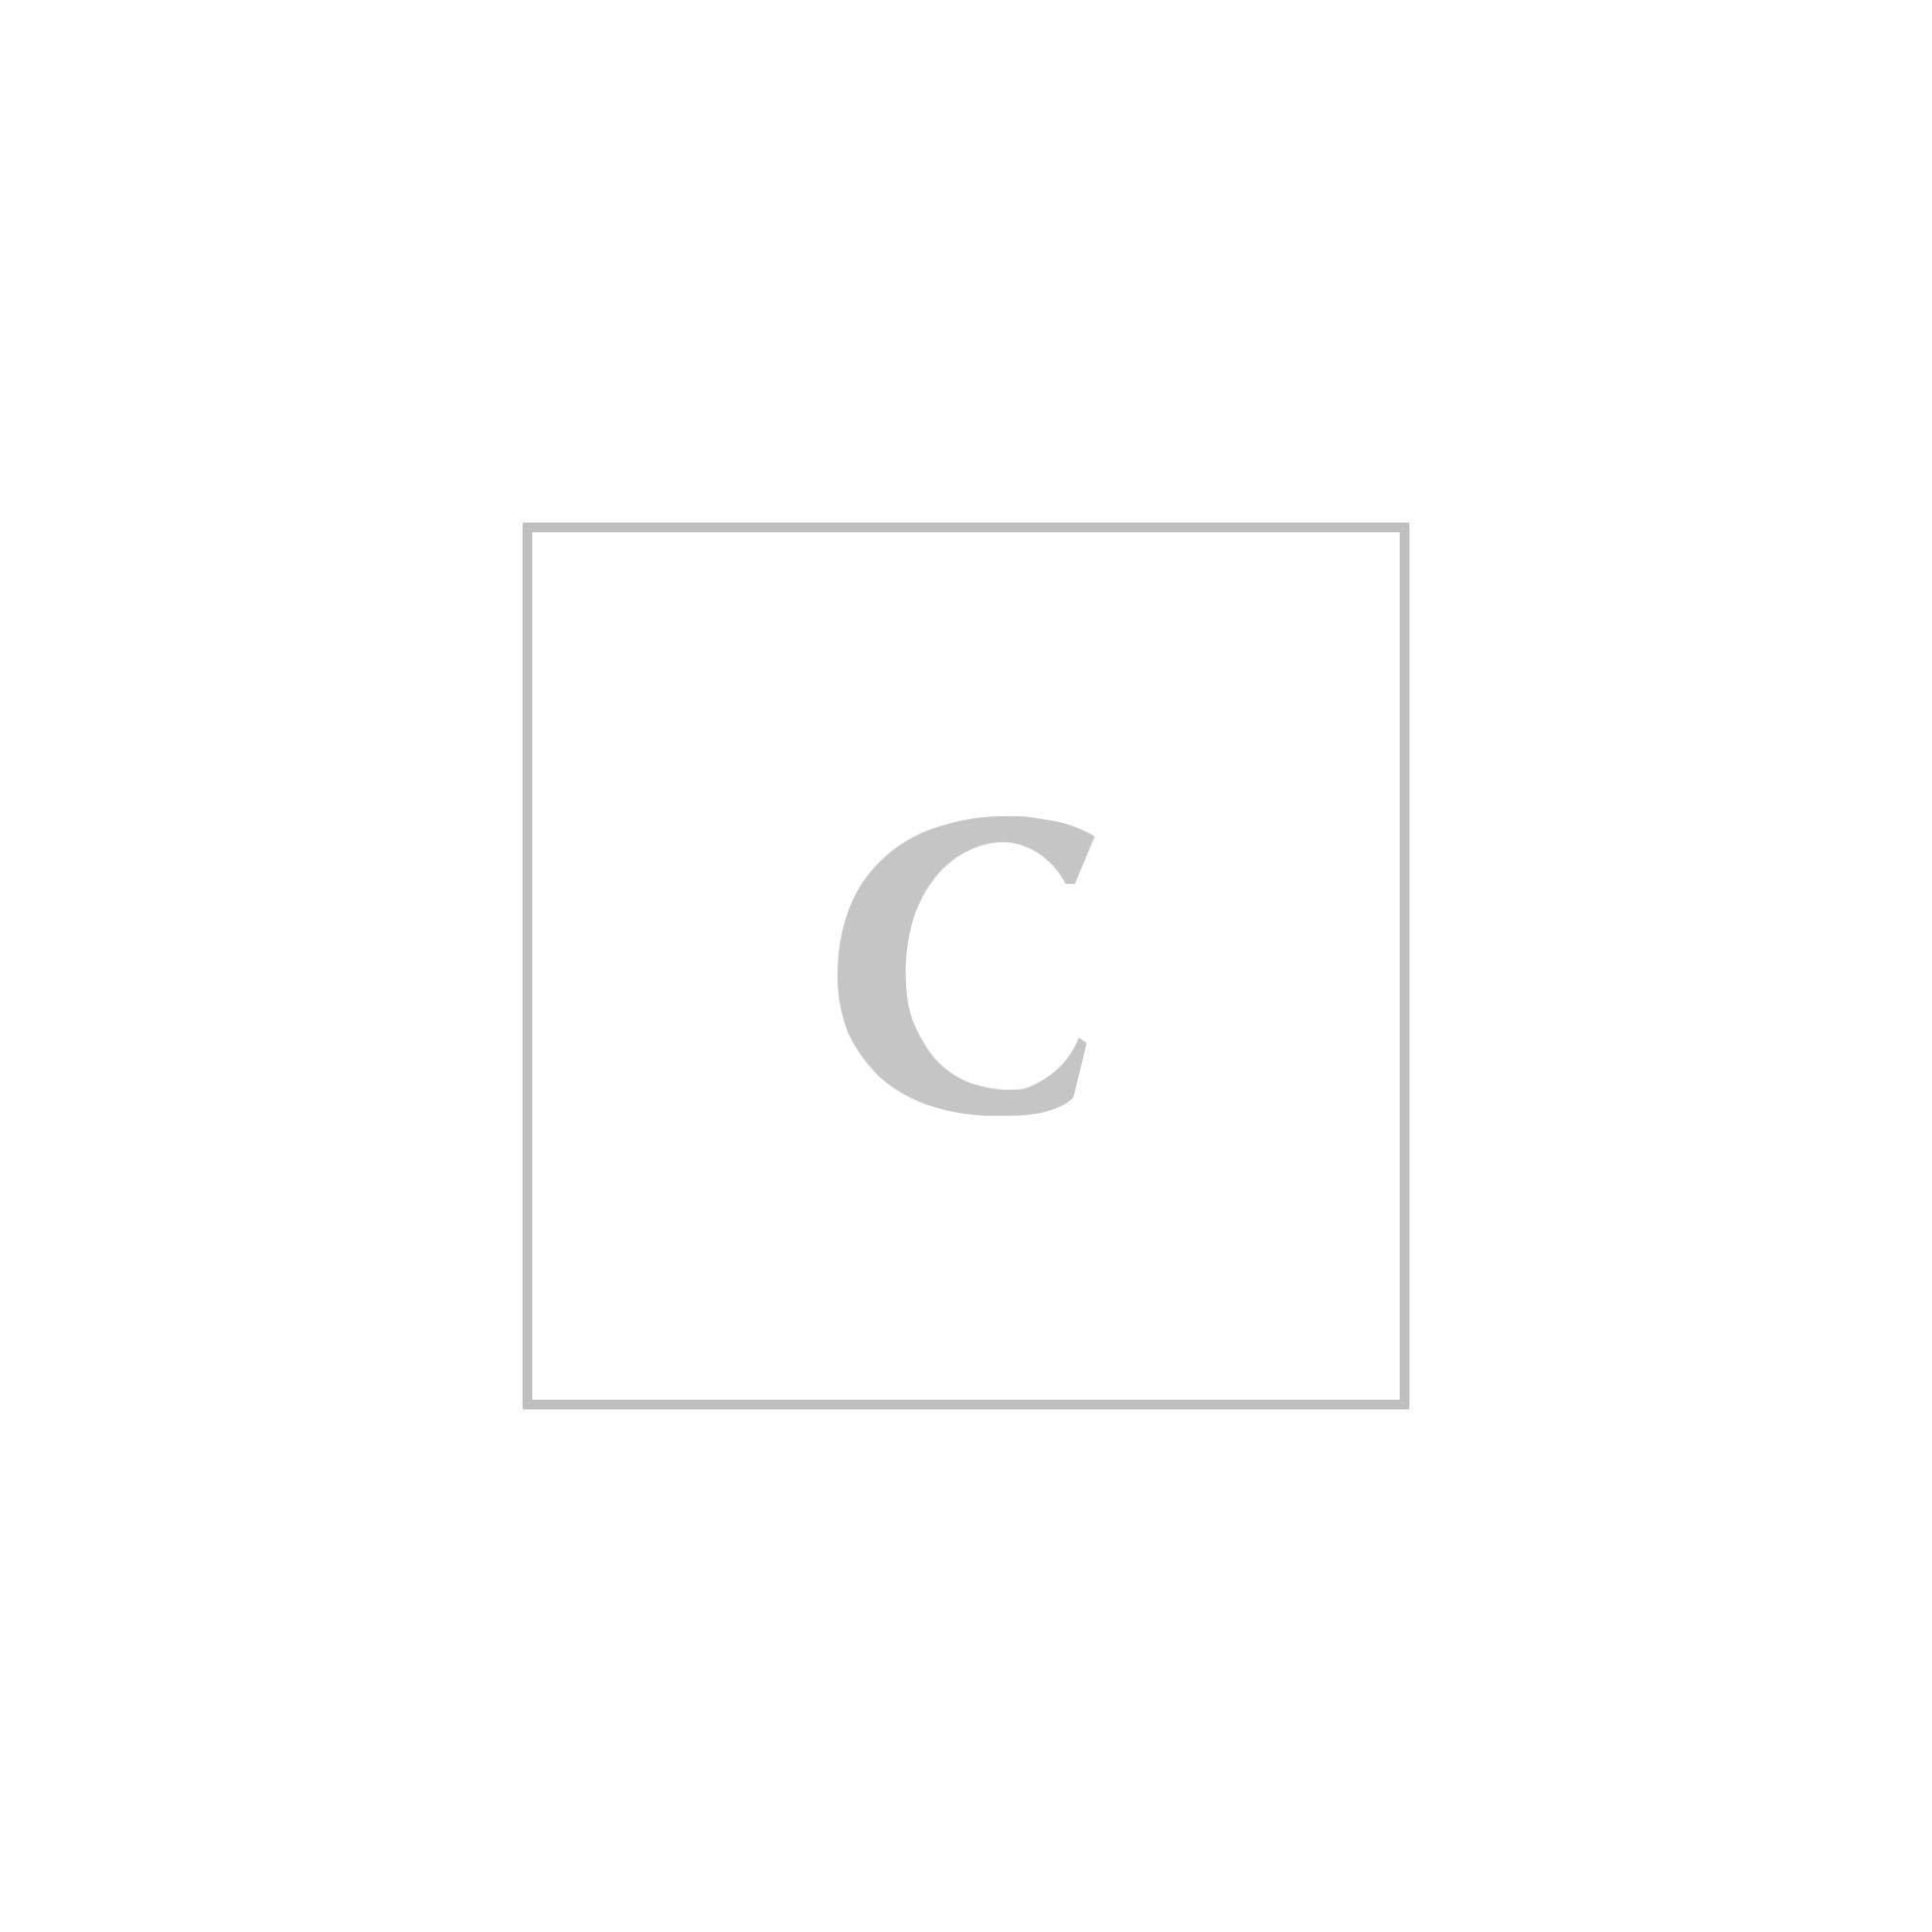 Stella mccartney metallic crackl mini tote bag